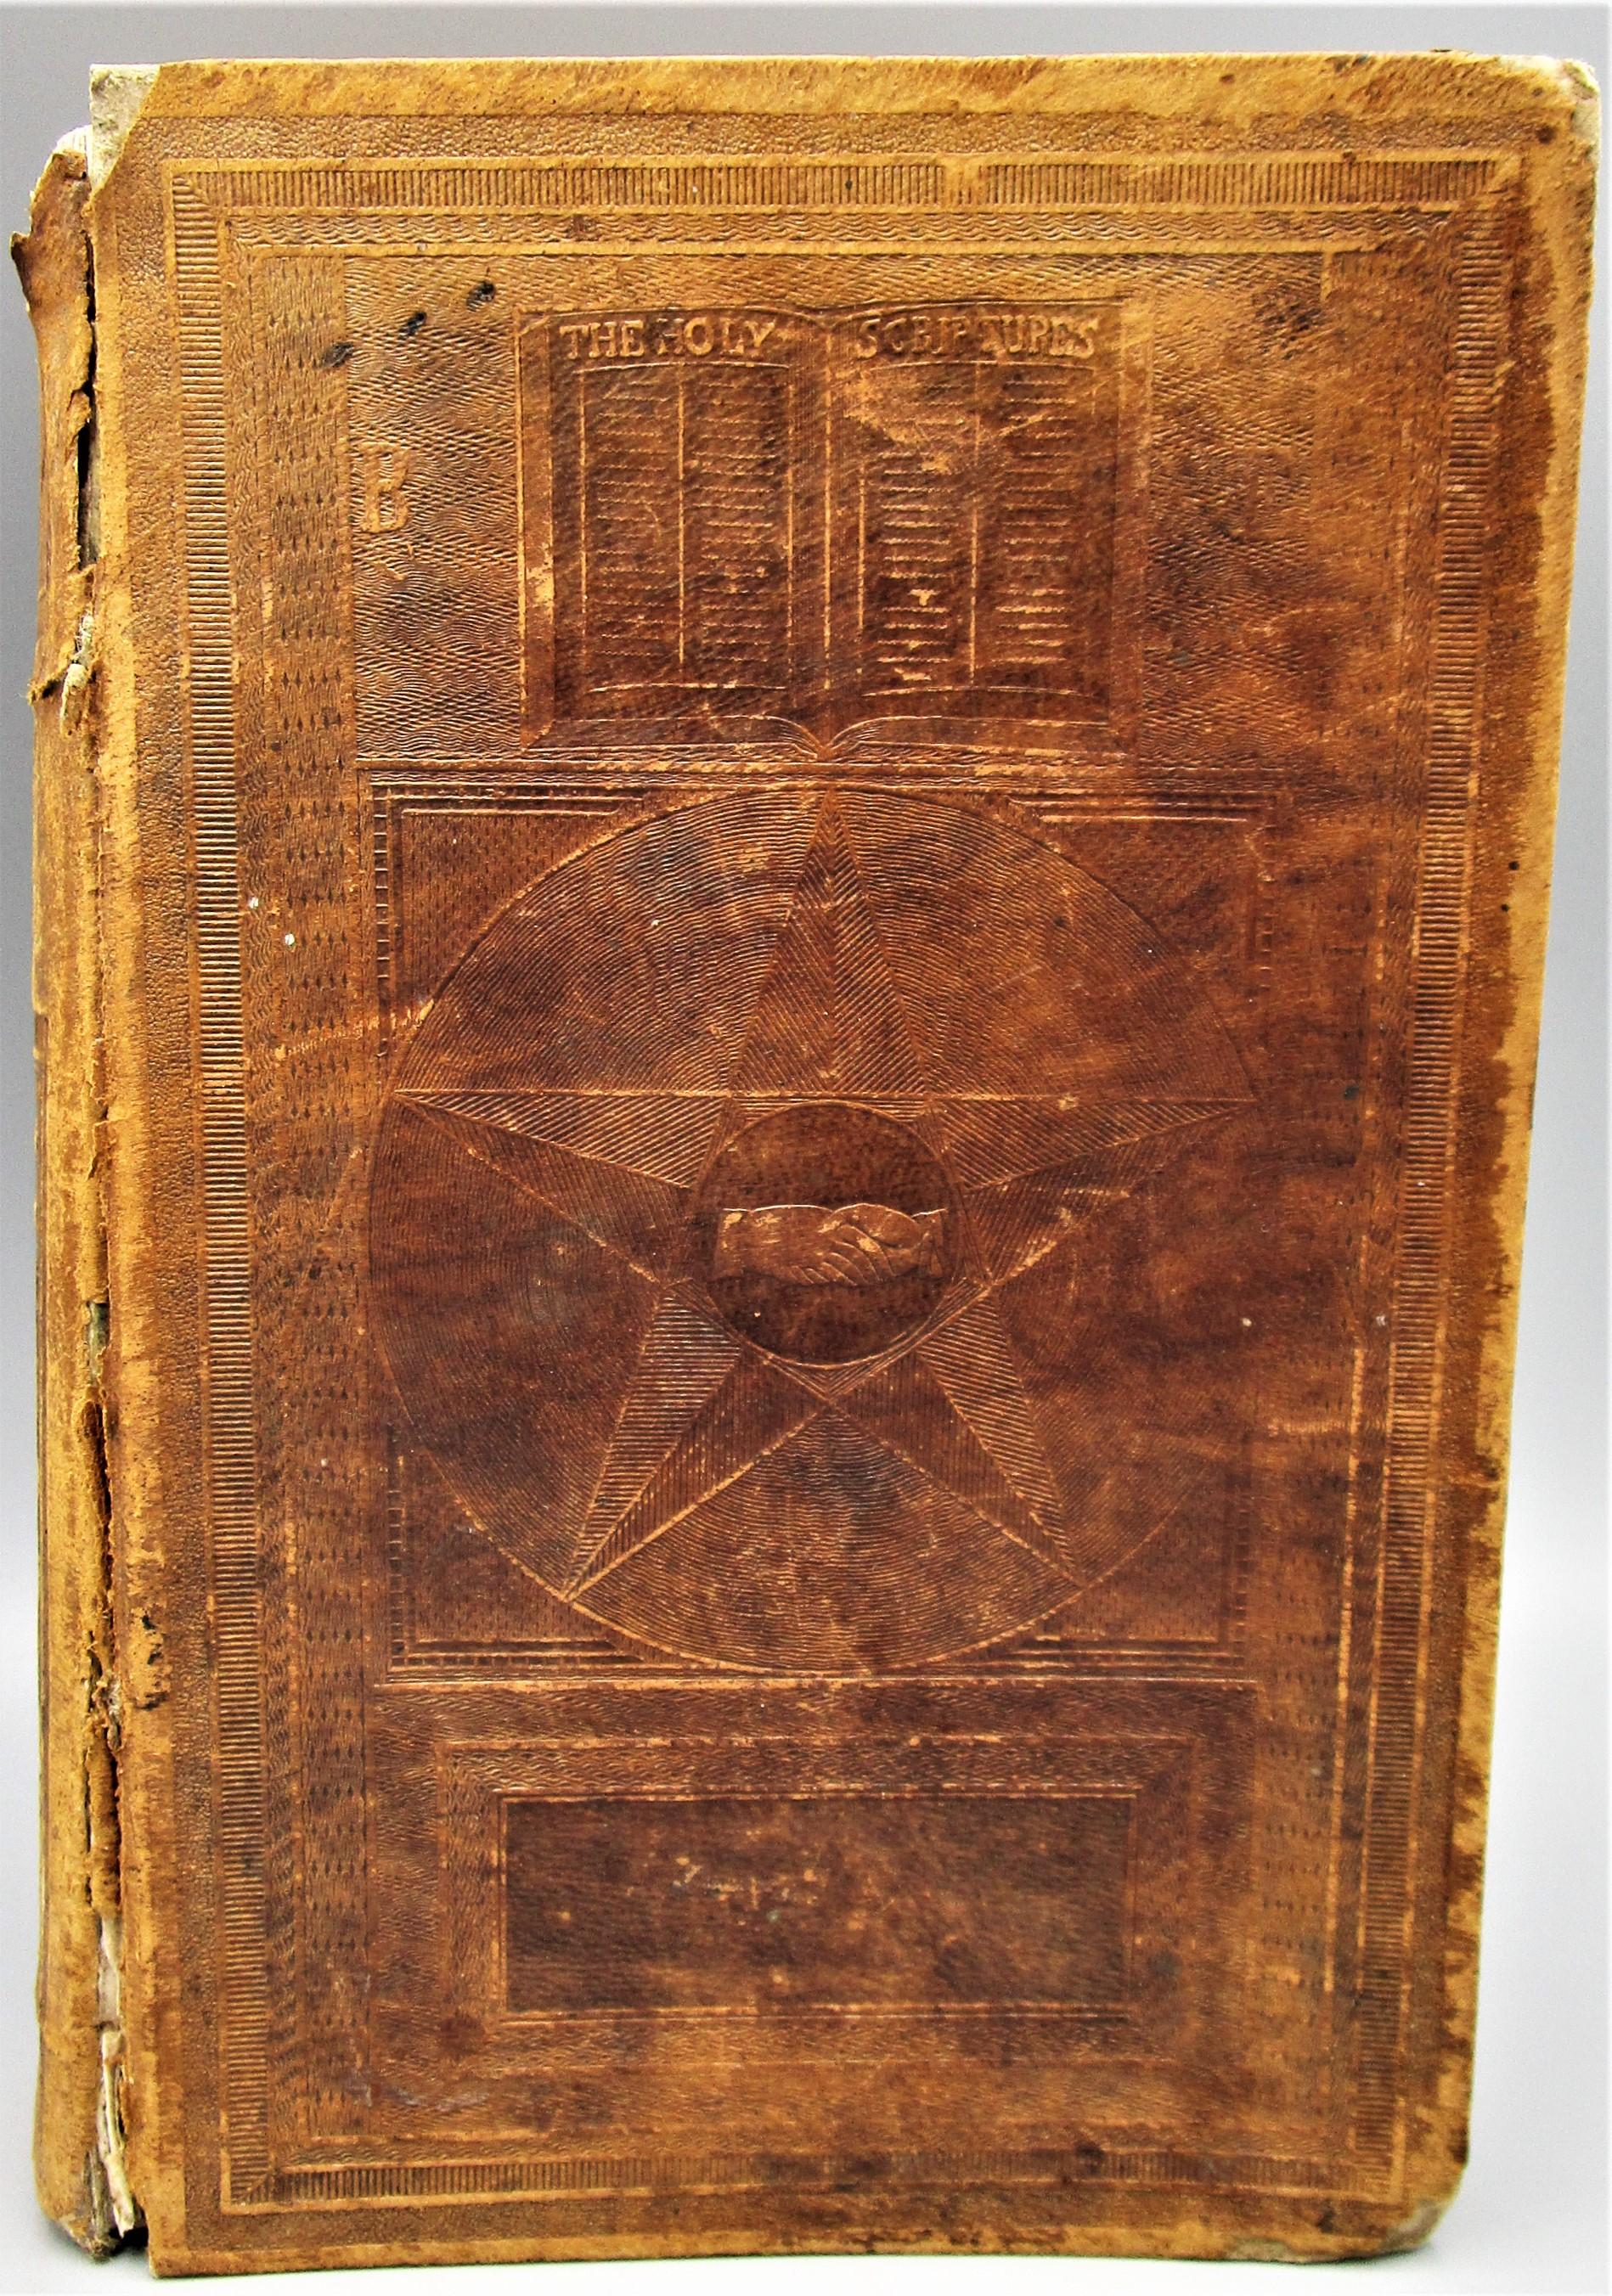 MYSTIC CIRCLE AND AMERICAN HANDBOOK OF MASONRY, by George H. Gray - 1852